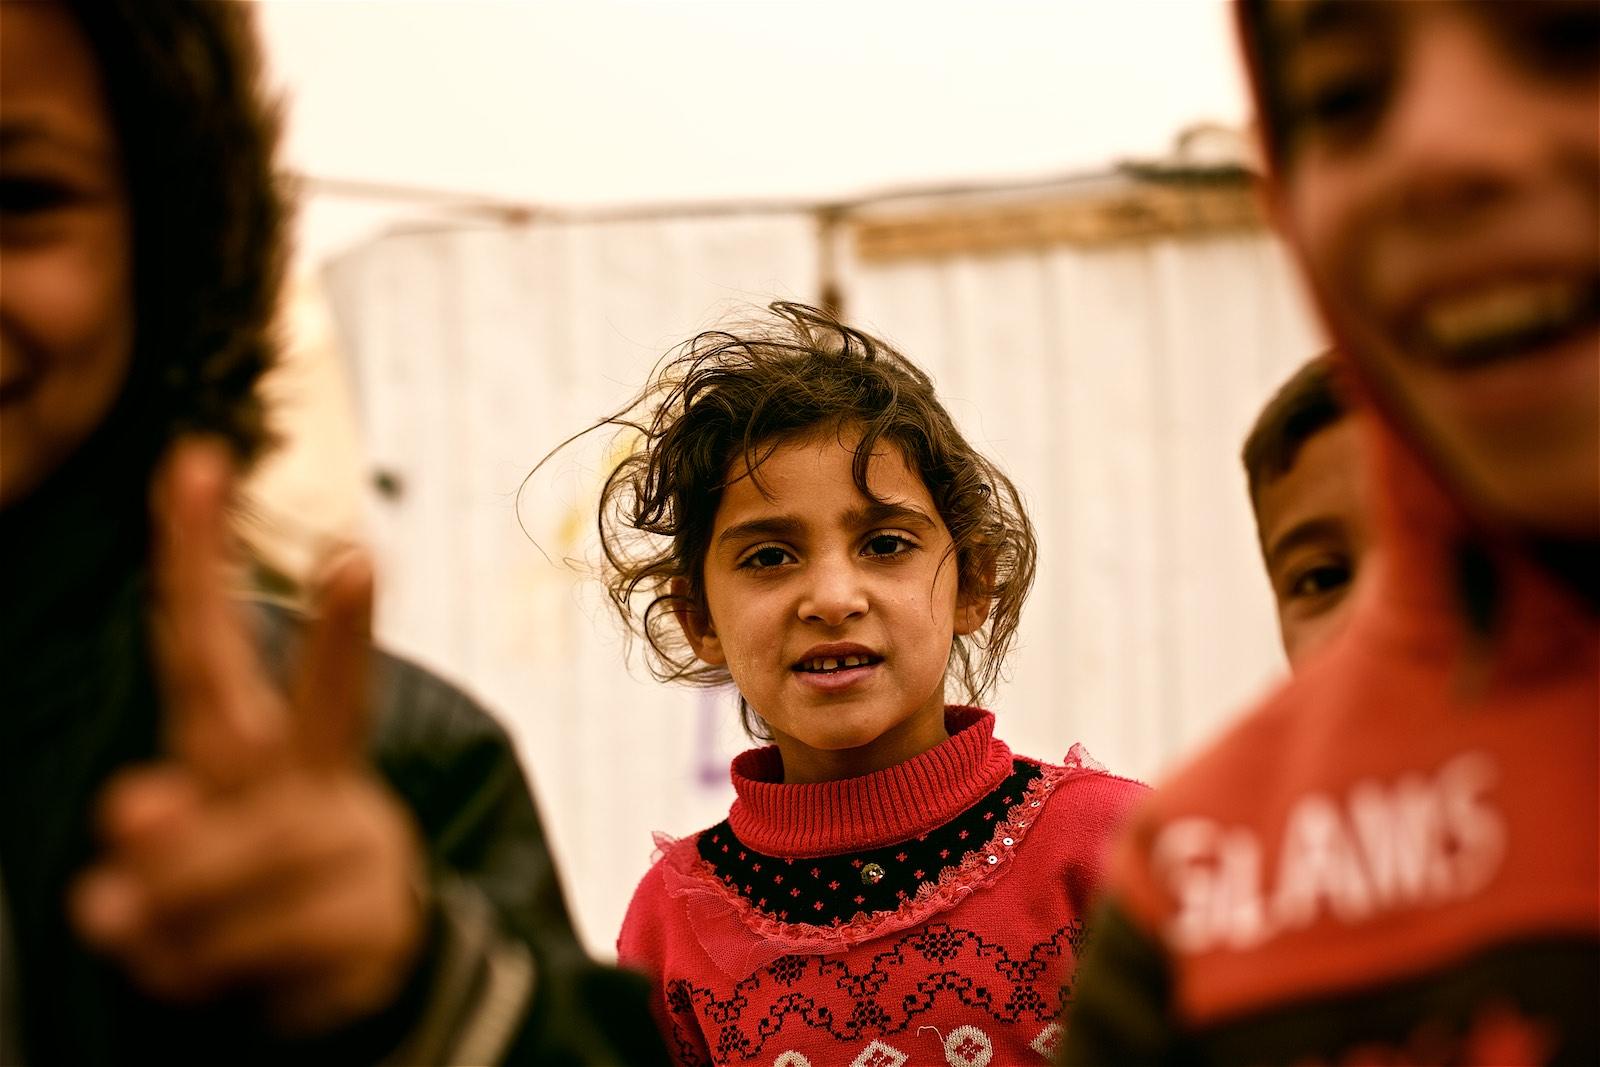 denis-bosnic-zaatari-jordan-refugee-camp-6.jpg